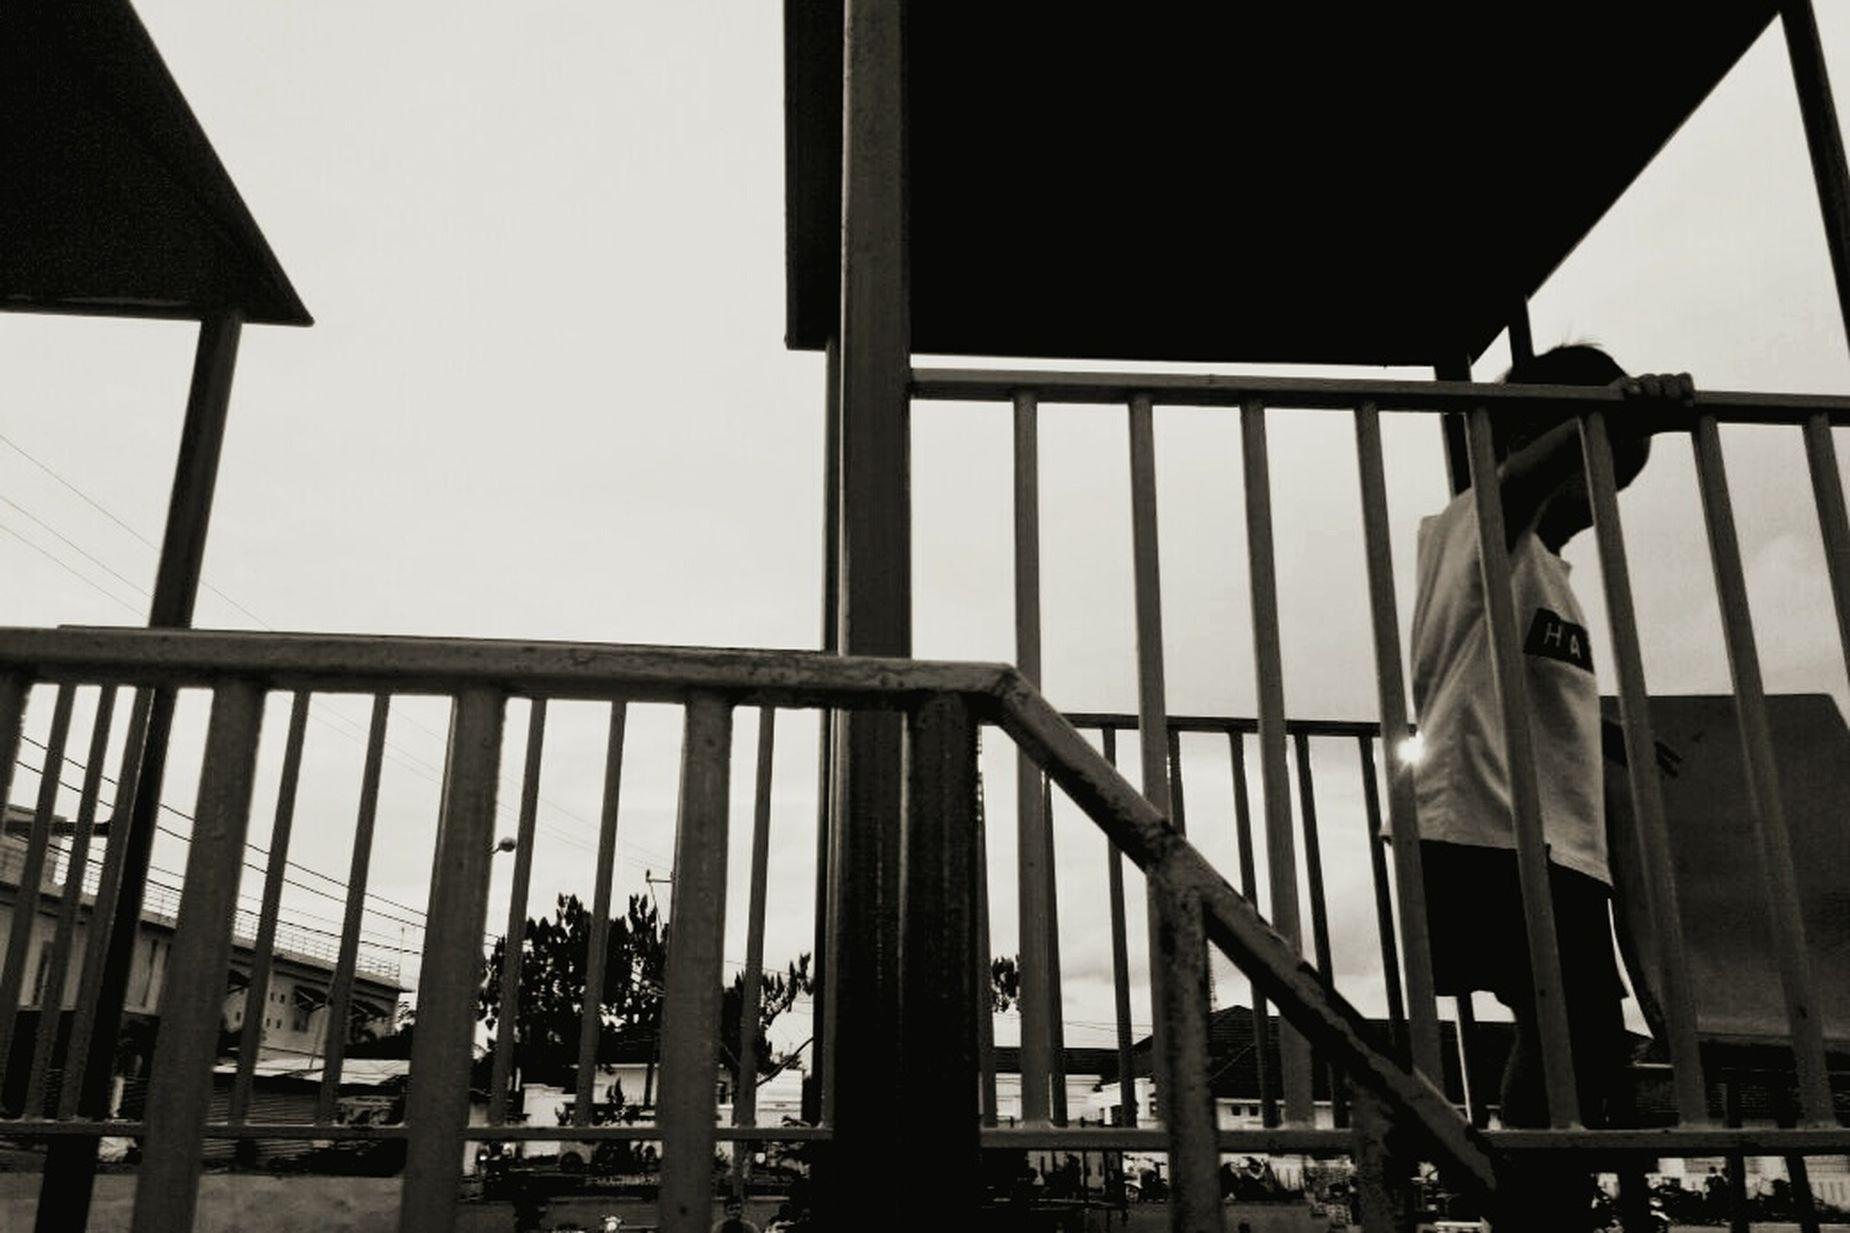 High Majeliskebudayaancilegon Roemahkaryamaslanggamraya Gerakanshodaqohkarya Kids Being Kids Climbing Try To Remember Bad Boy  Built Structure Architecture Low Angle View Day Outdoors No People Sky